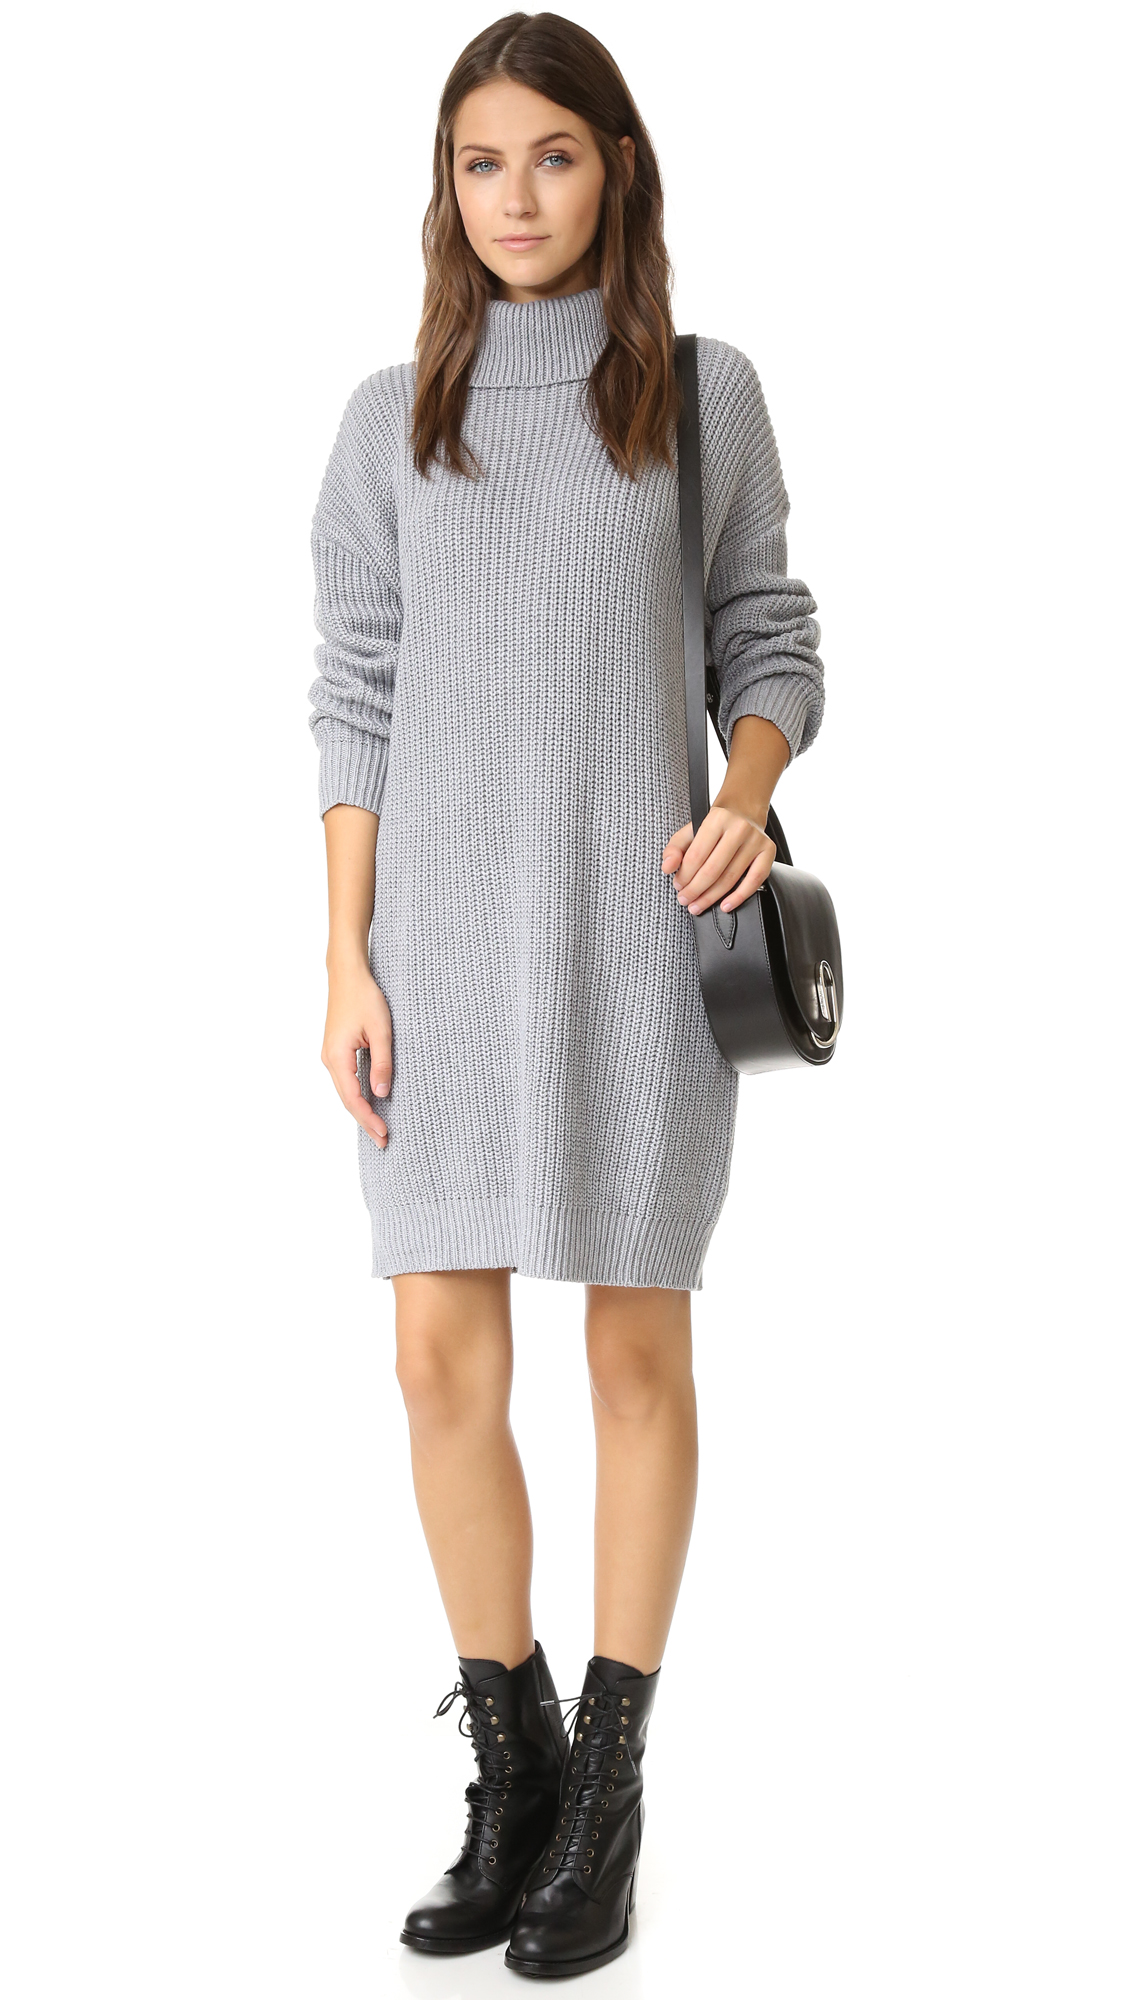 9e0af33e140 Lovers + Friends Christina Sweater Dress